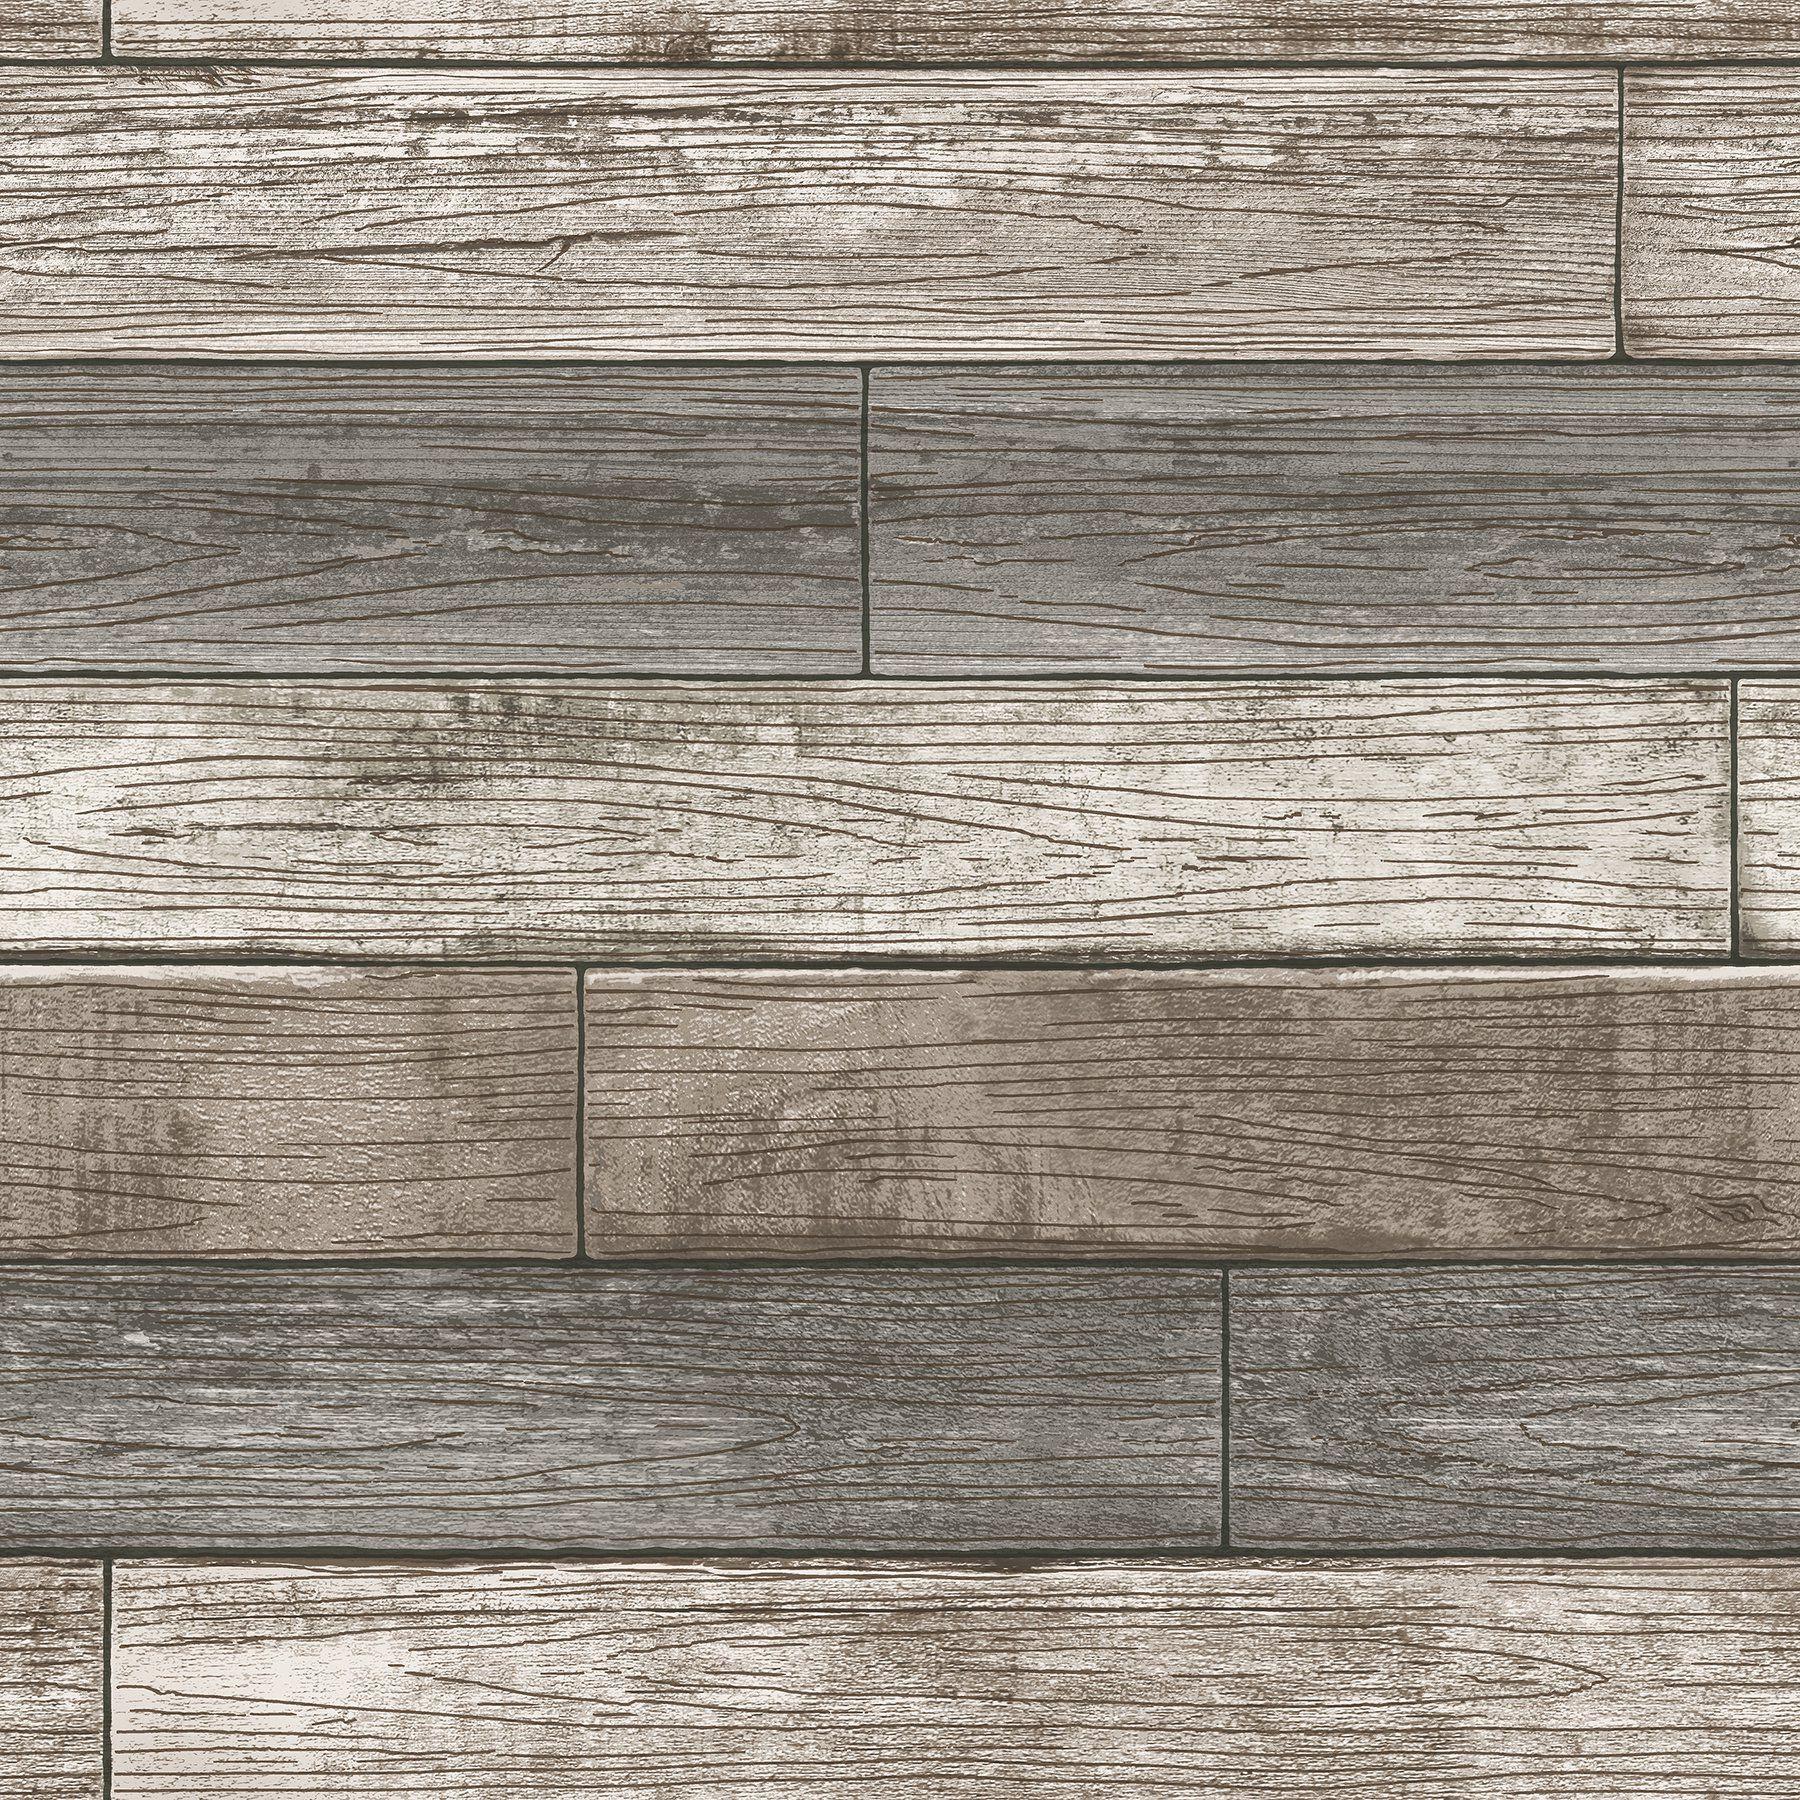 Nuwallpaper Reclaimed Wood Plank Natural Raised Ink Peel Stick Wallpaper Walmart Com In 2021 Nuwallpaper Wood Planks Peel And Stick Wallpaper